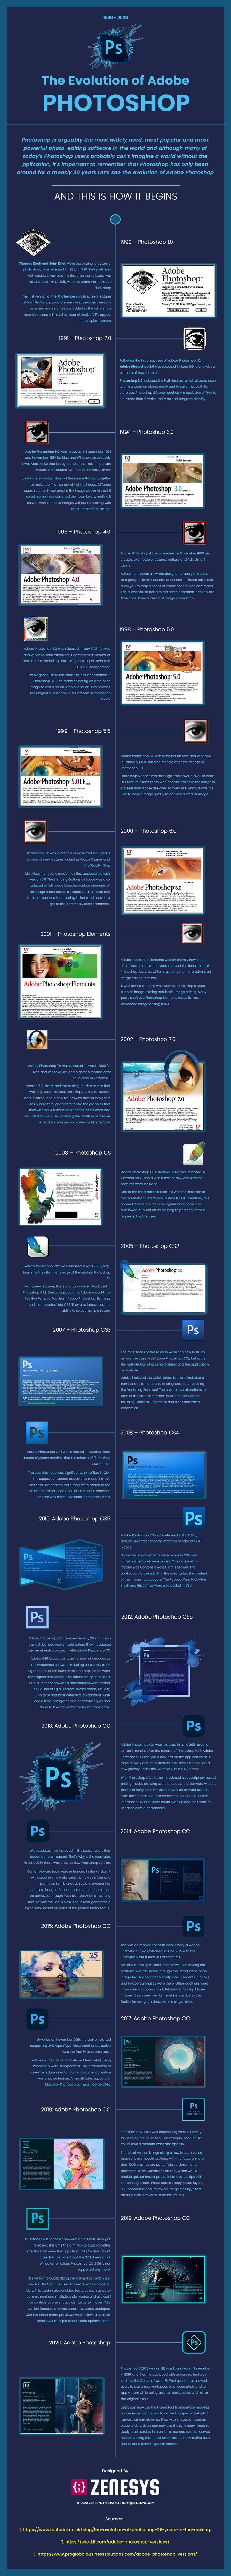 the-evolution-of-adobe-photoshop-infographic